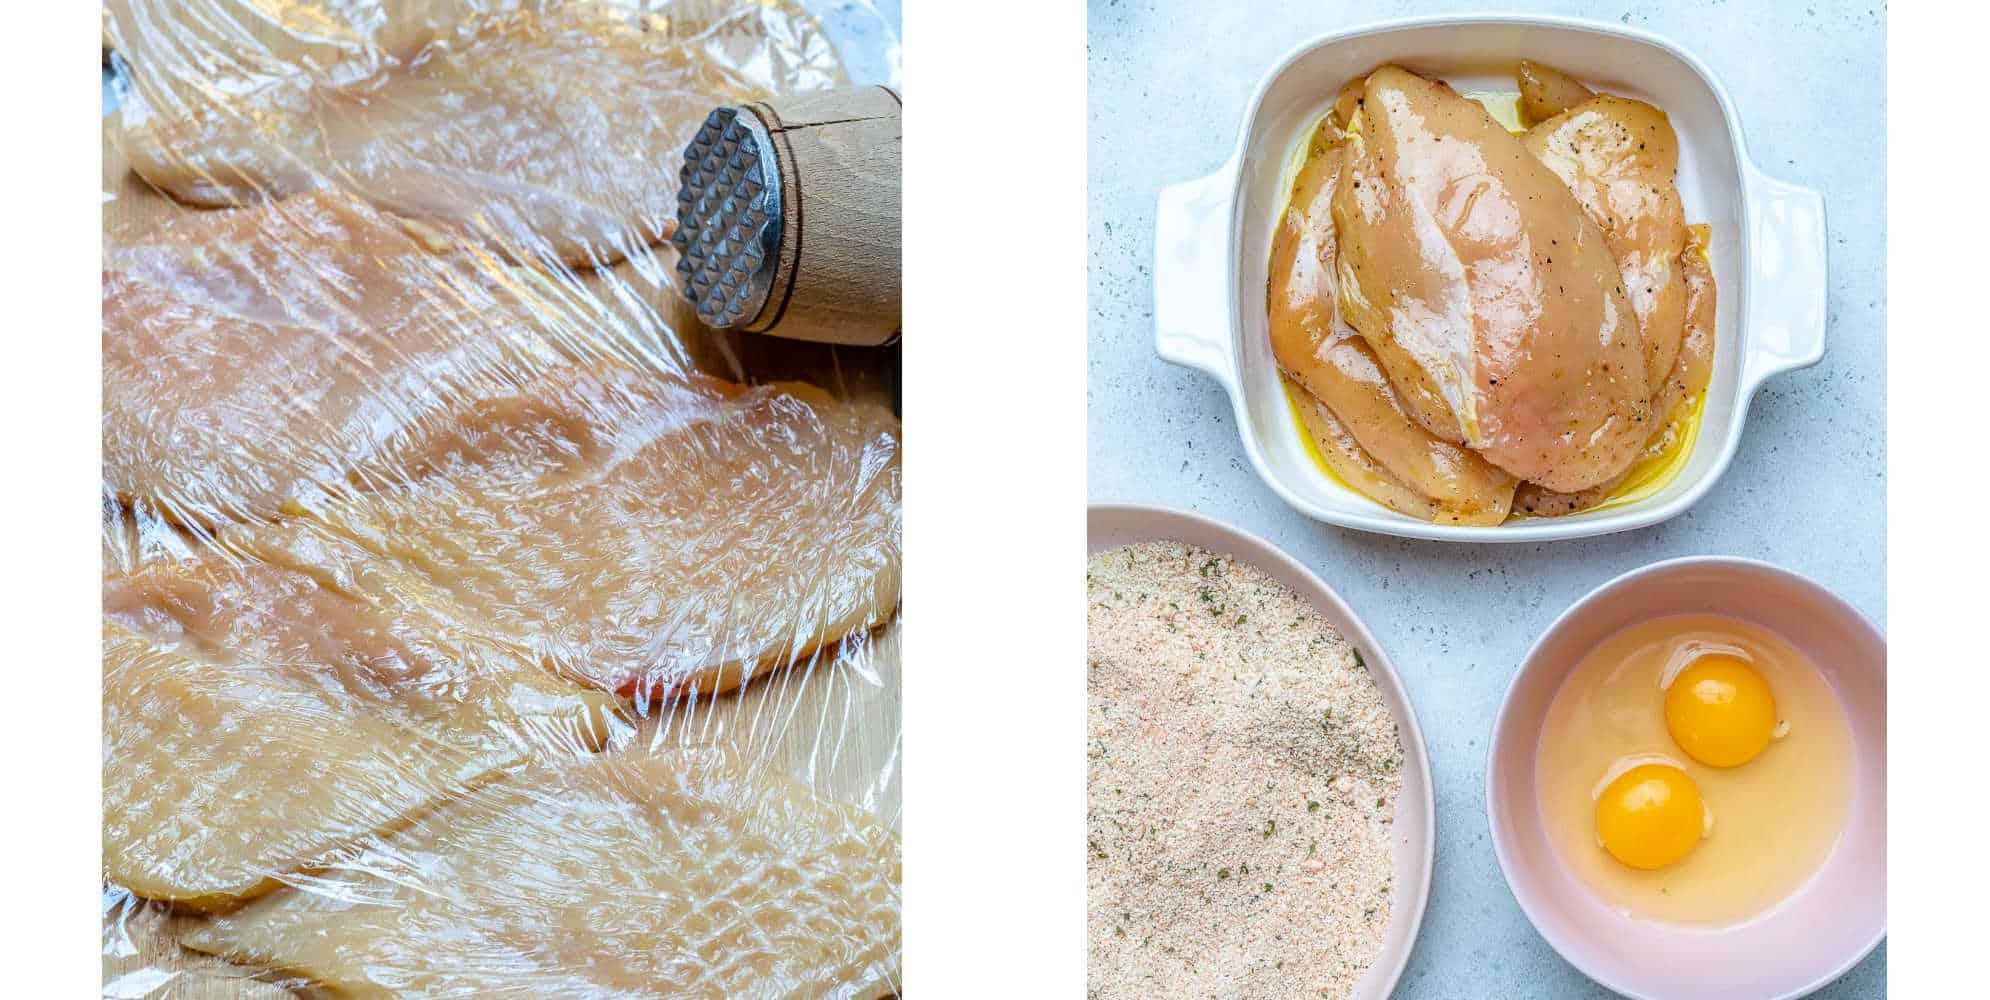 crispy baked chicken cutlet